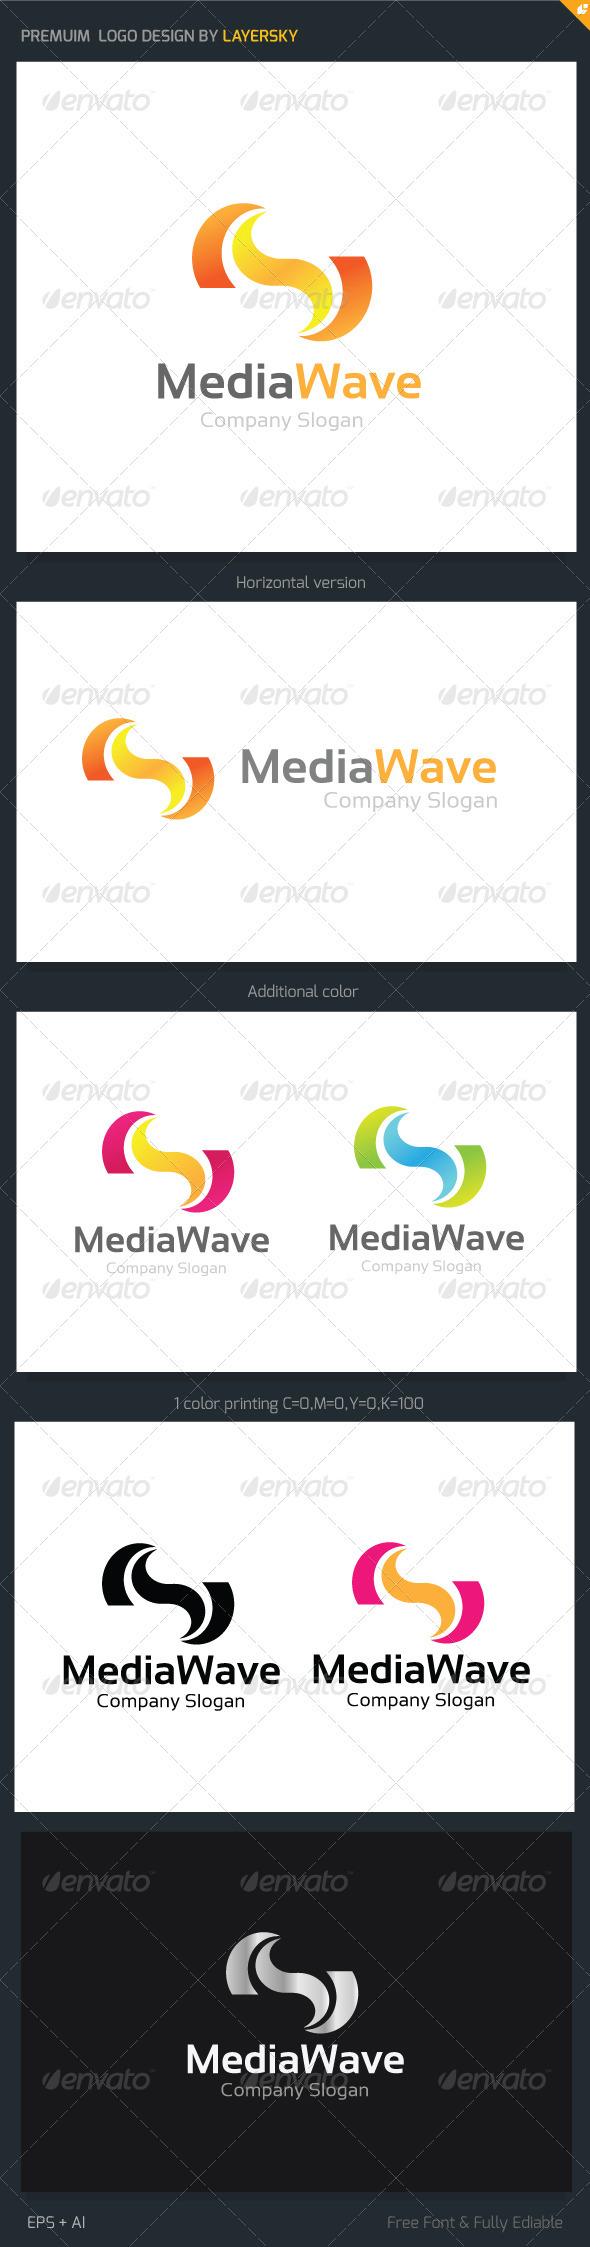 Media Wave Logo - Vector Abstract